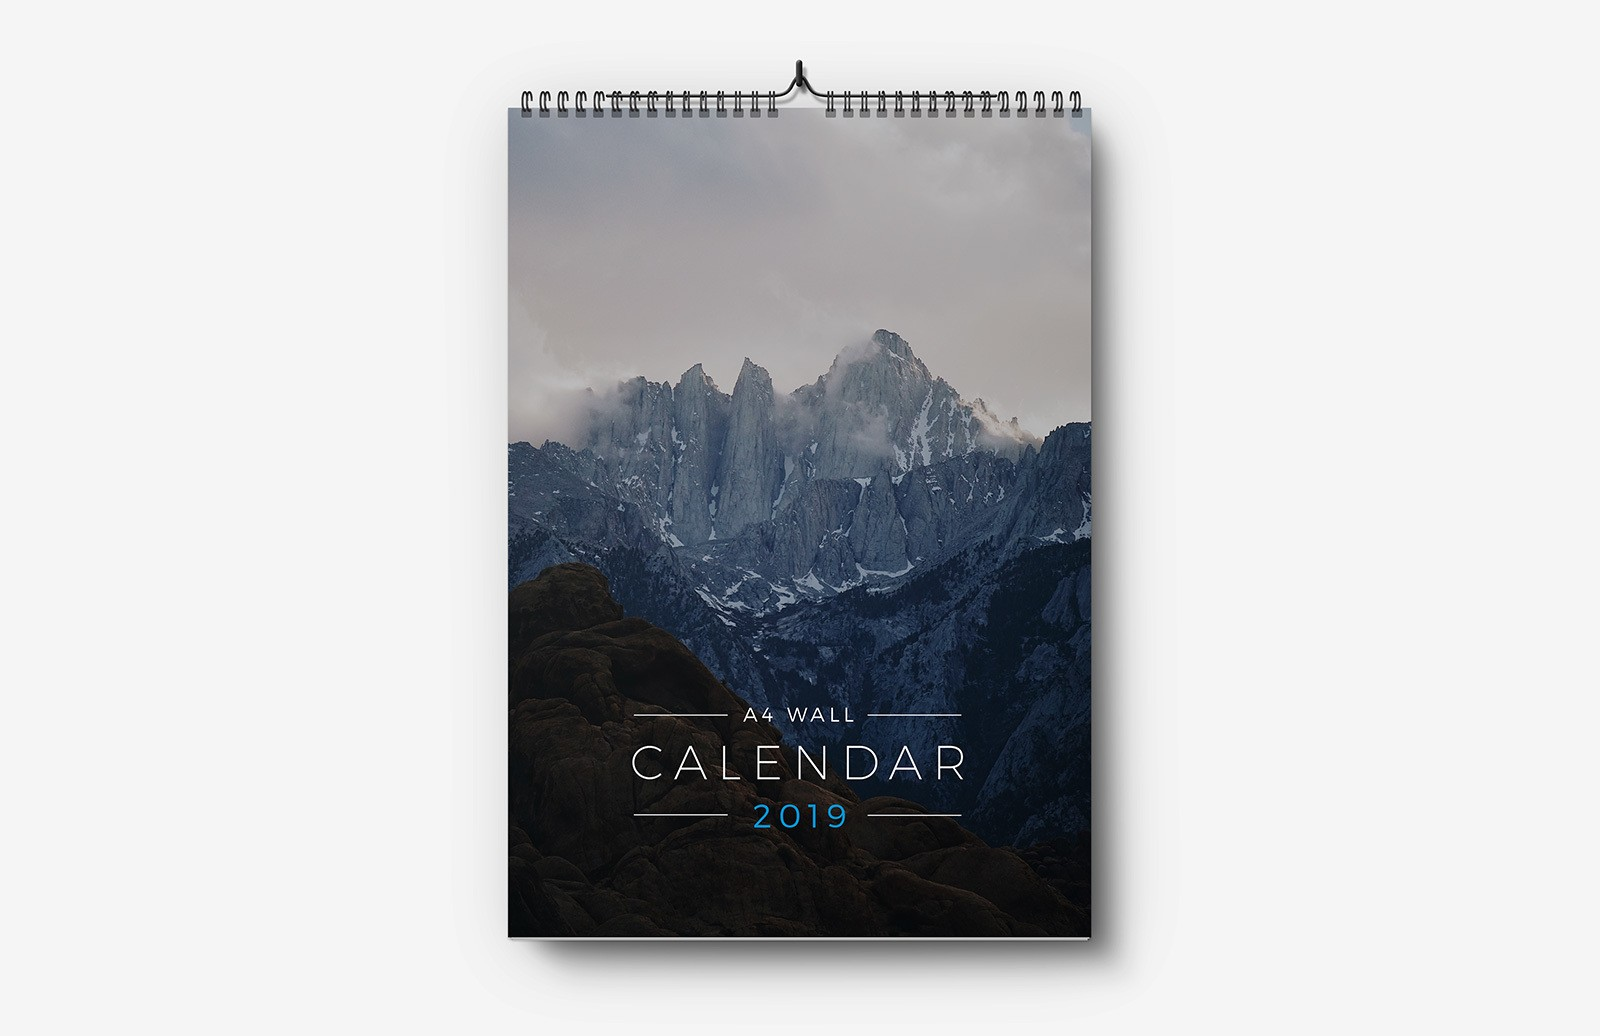 A4 Wall Calendar Template 2019 Preview 1